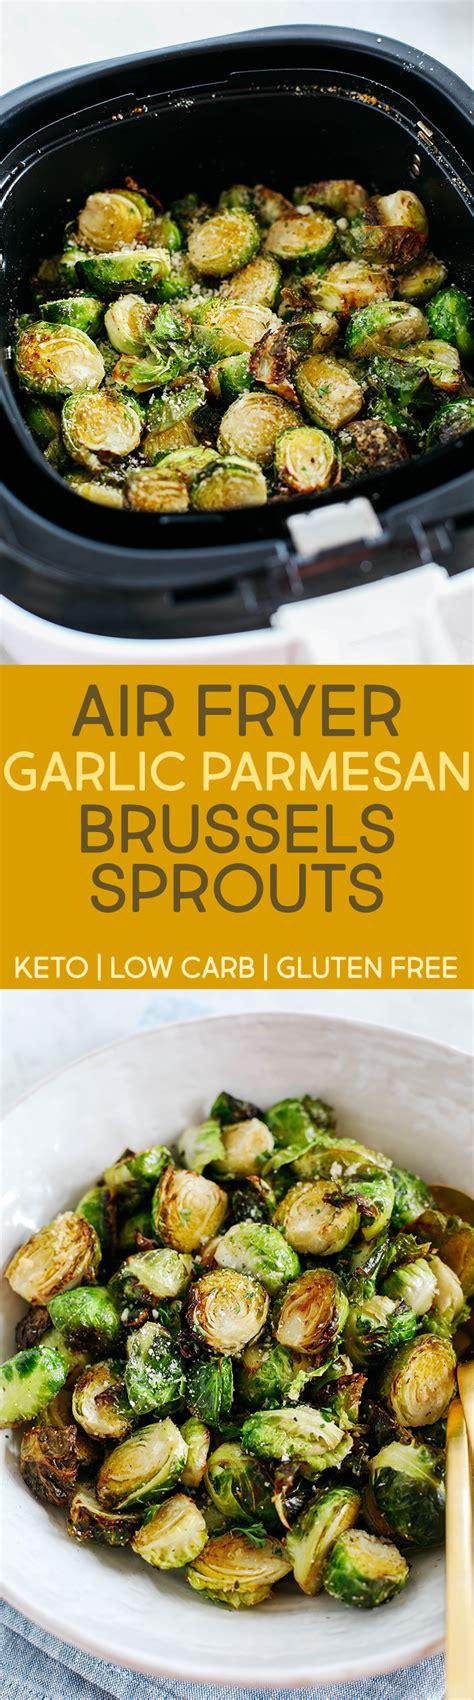 brussels sprouts air fryer parmesan garlic crispy